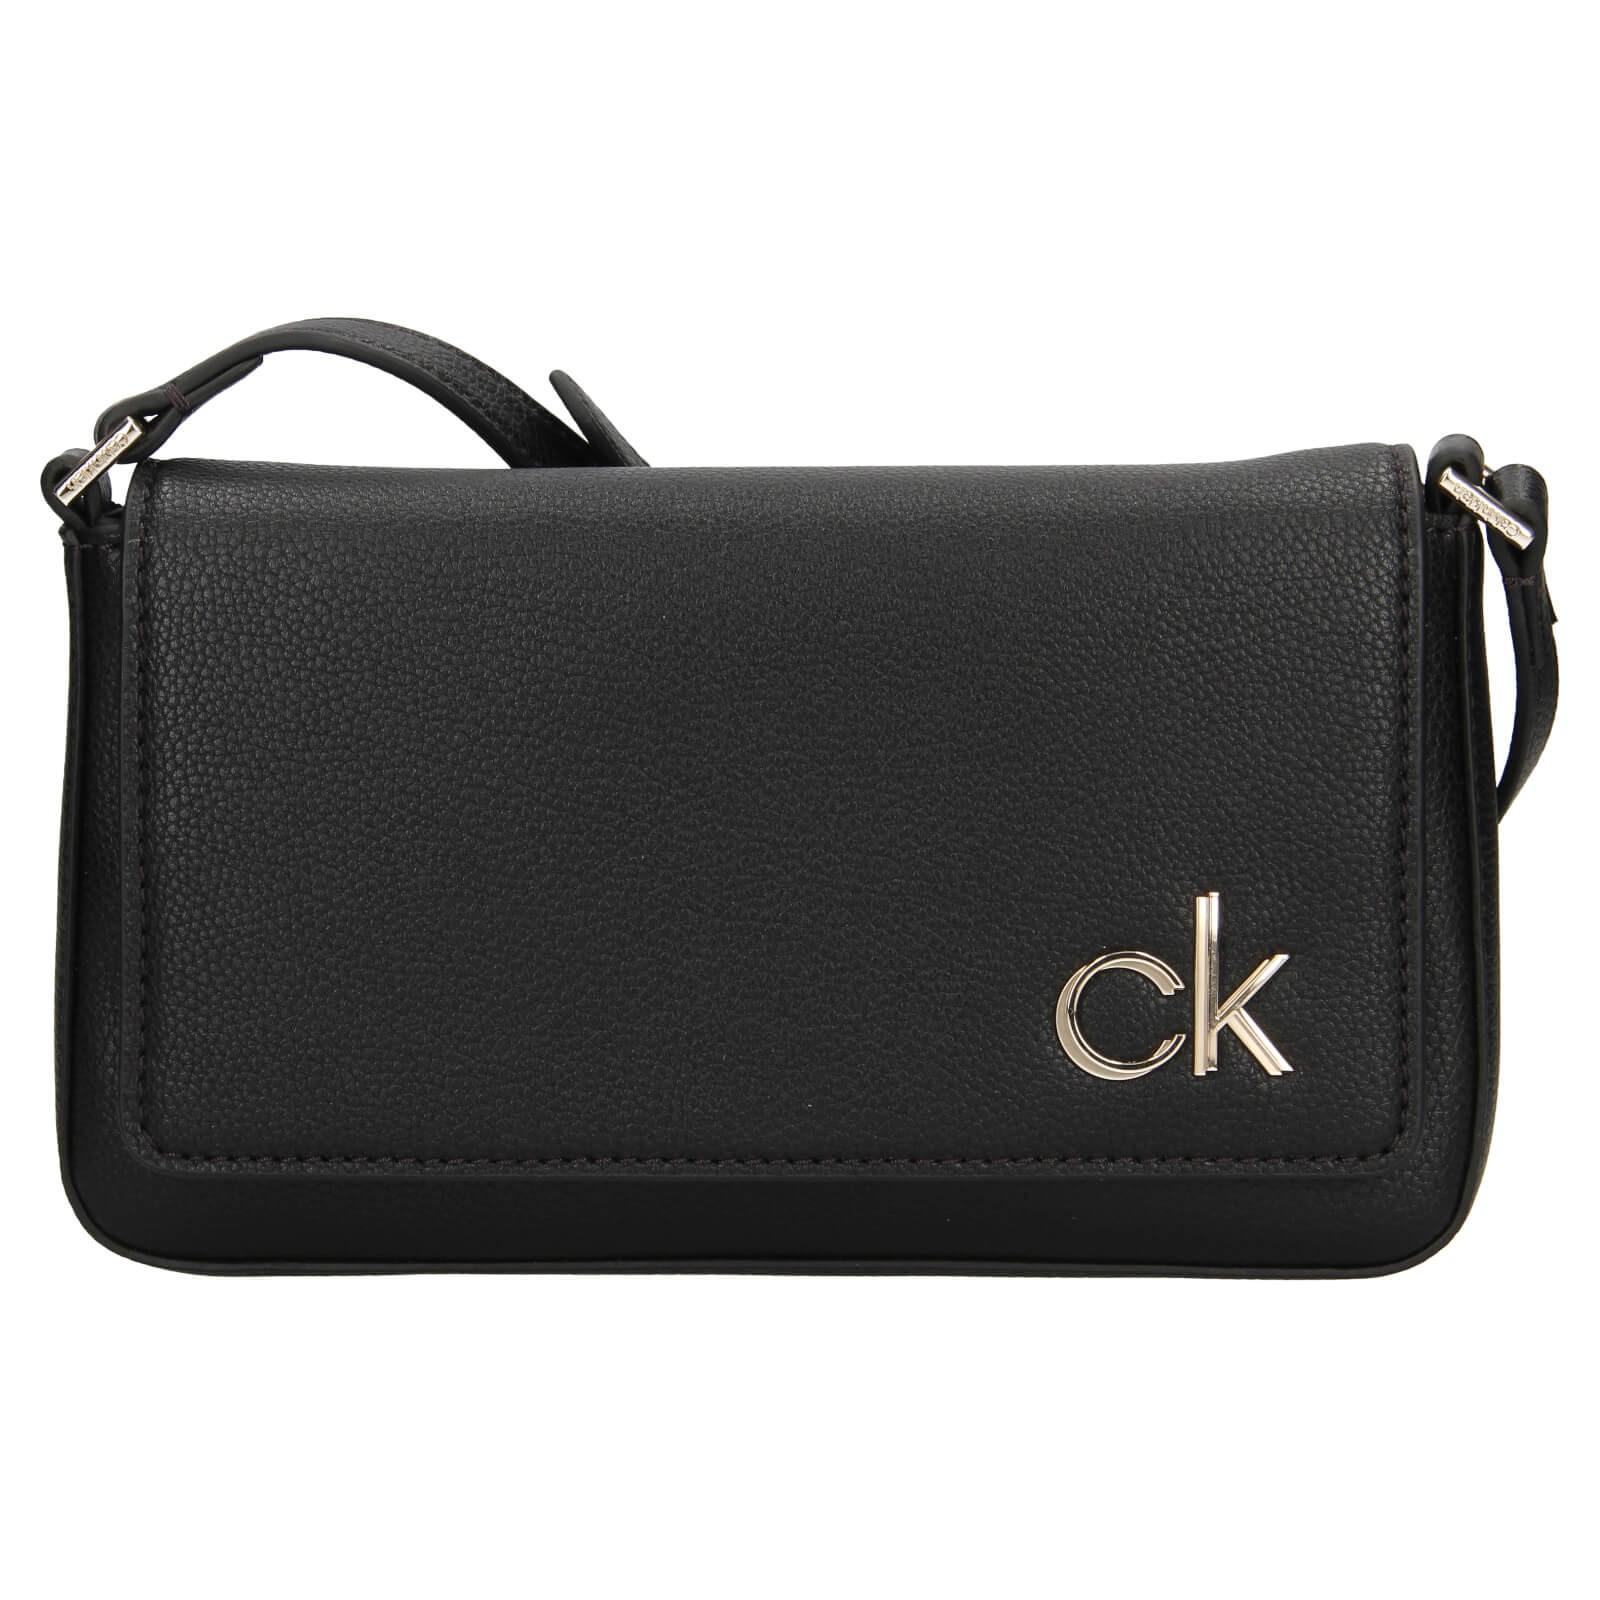 Dámska crossbody kabelka Calvin Klein Brian - čierna